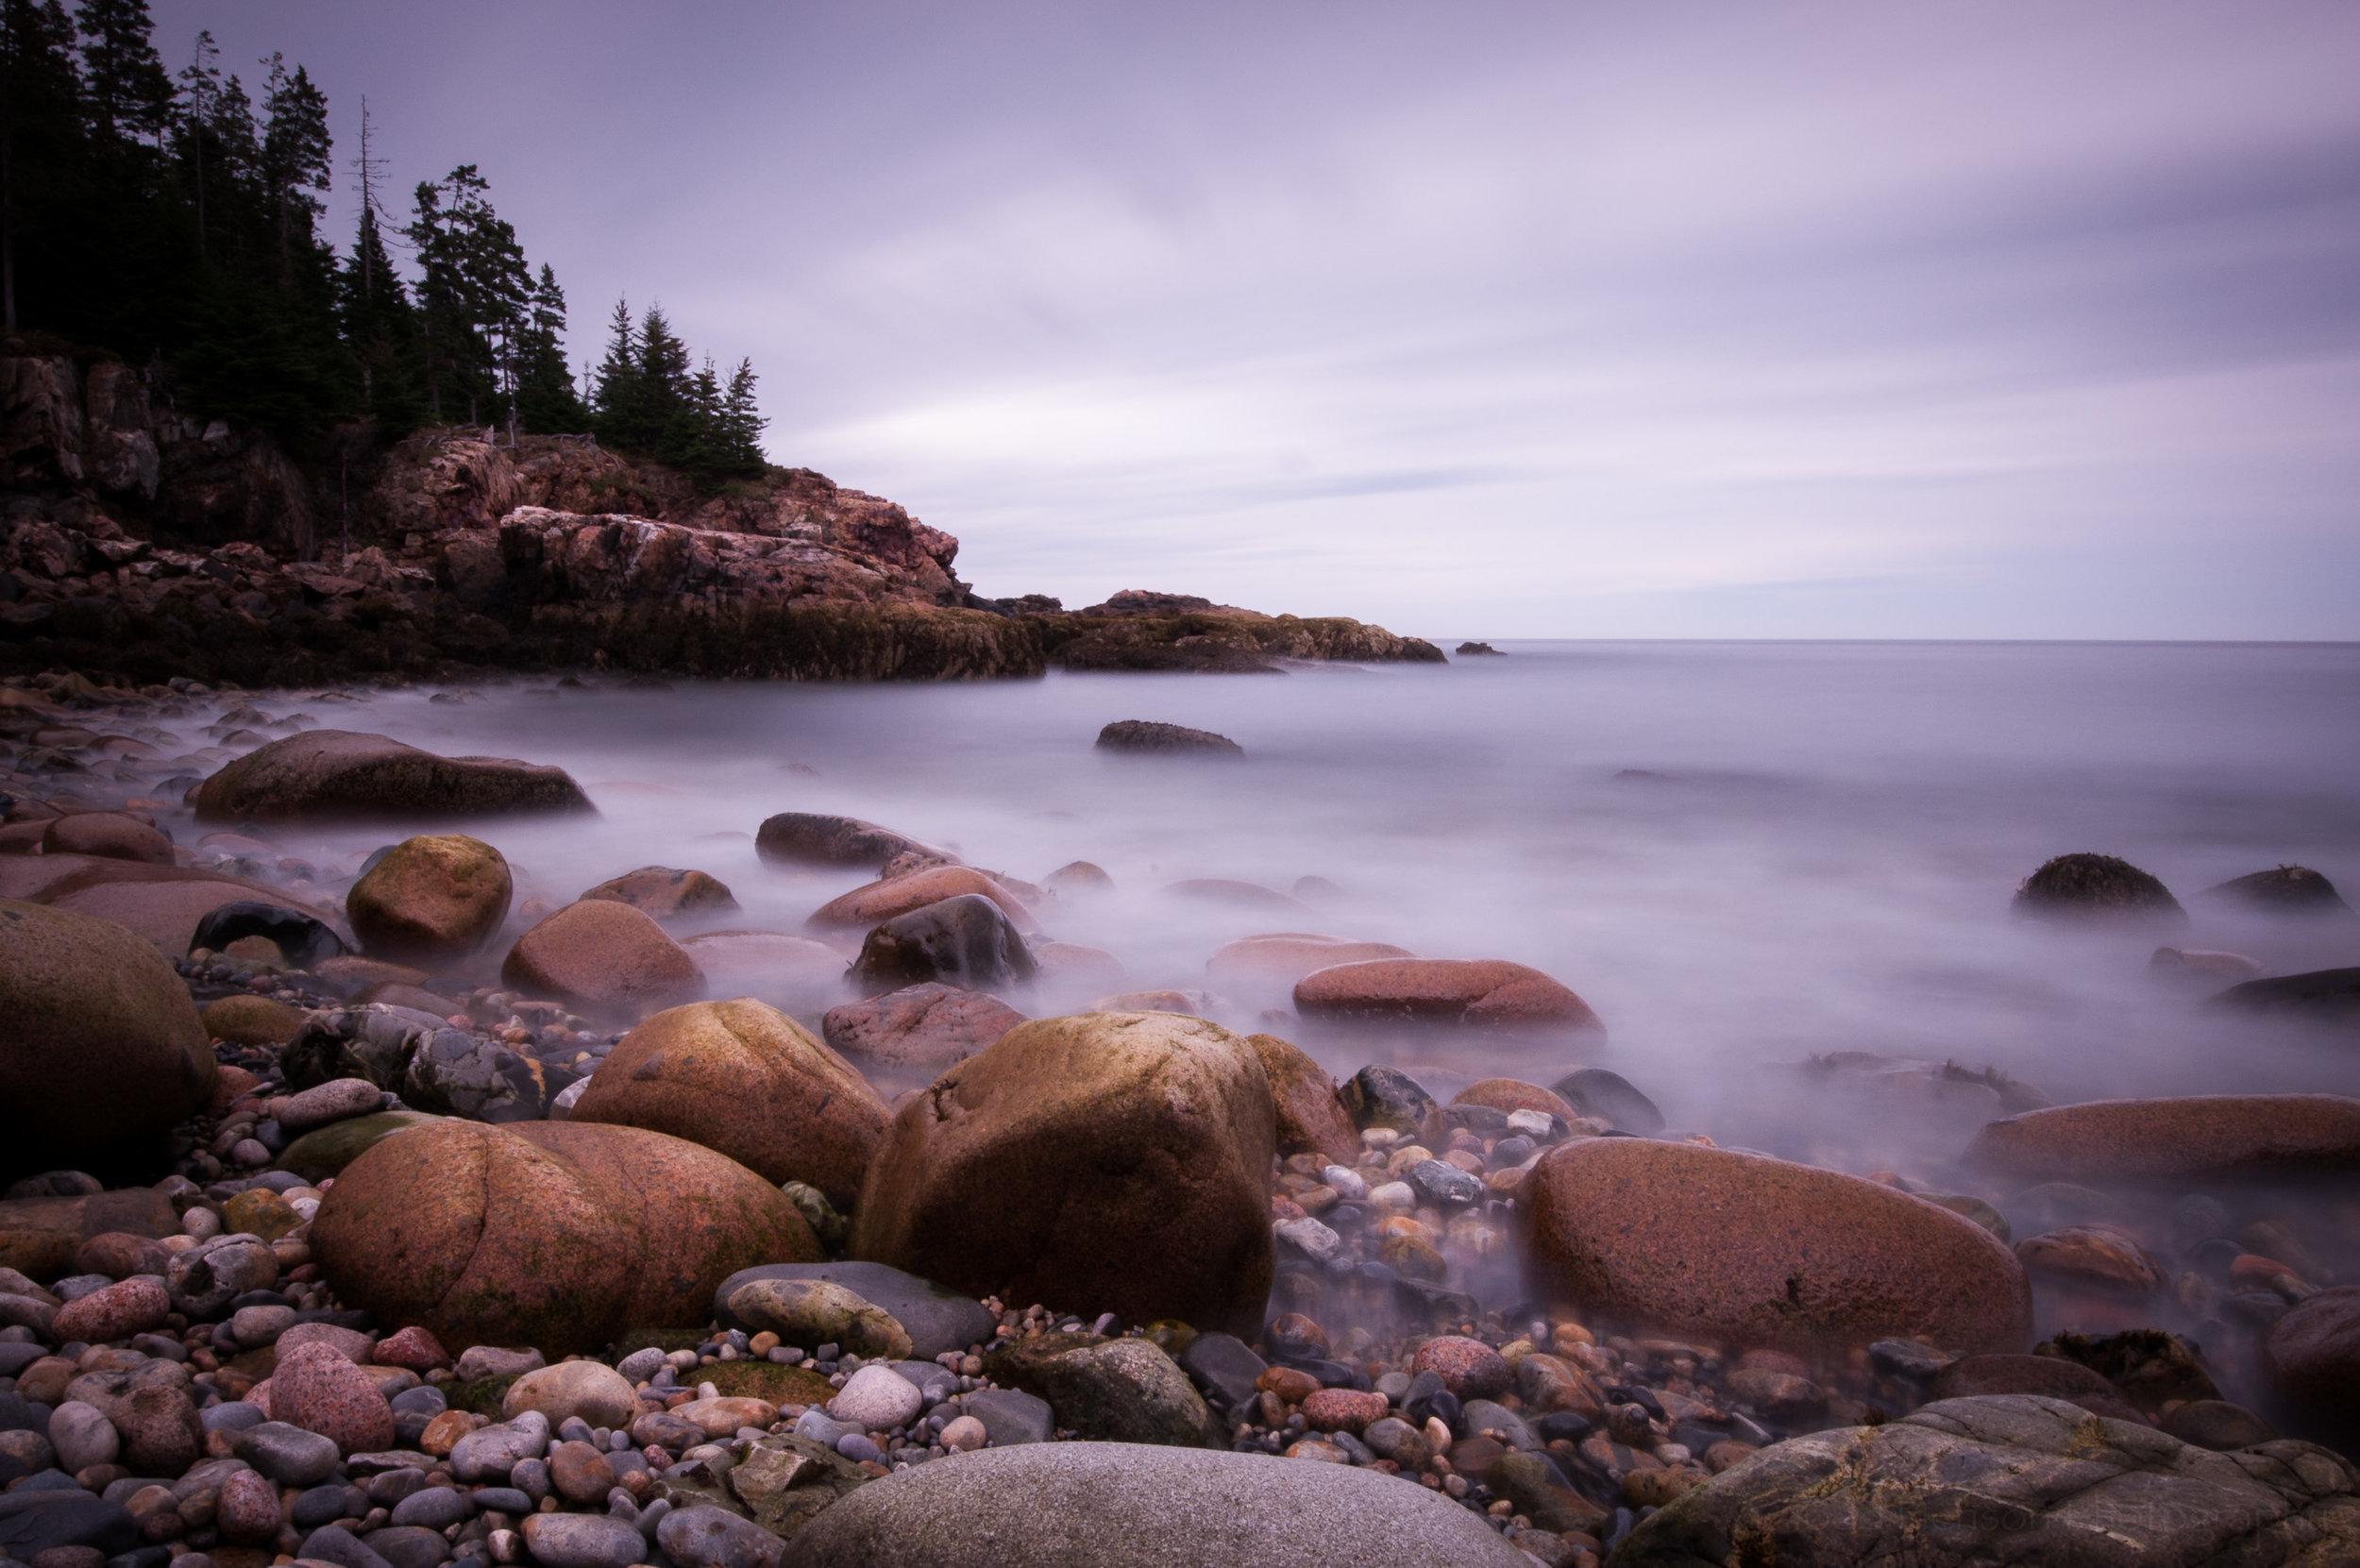 Alone on the Rocky Beach